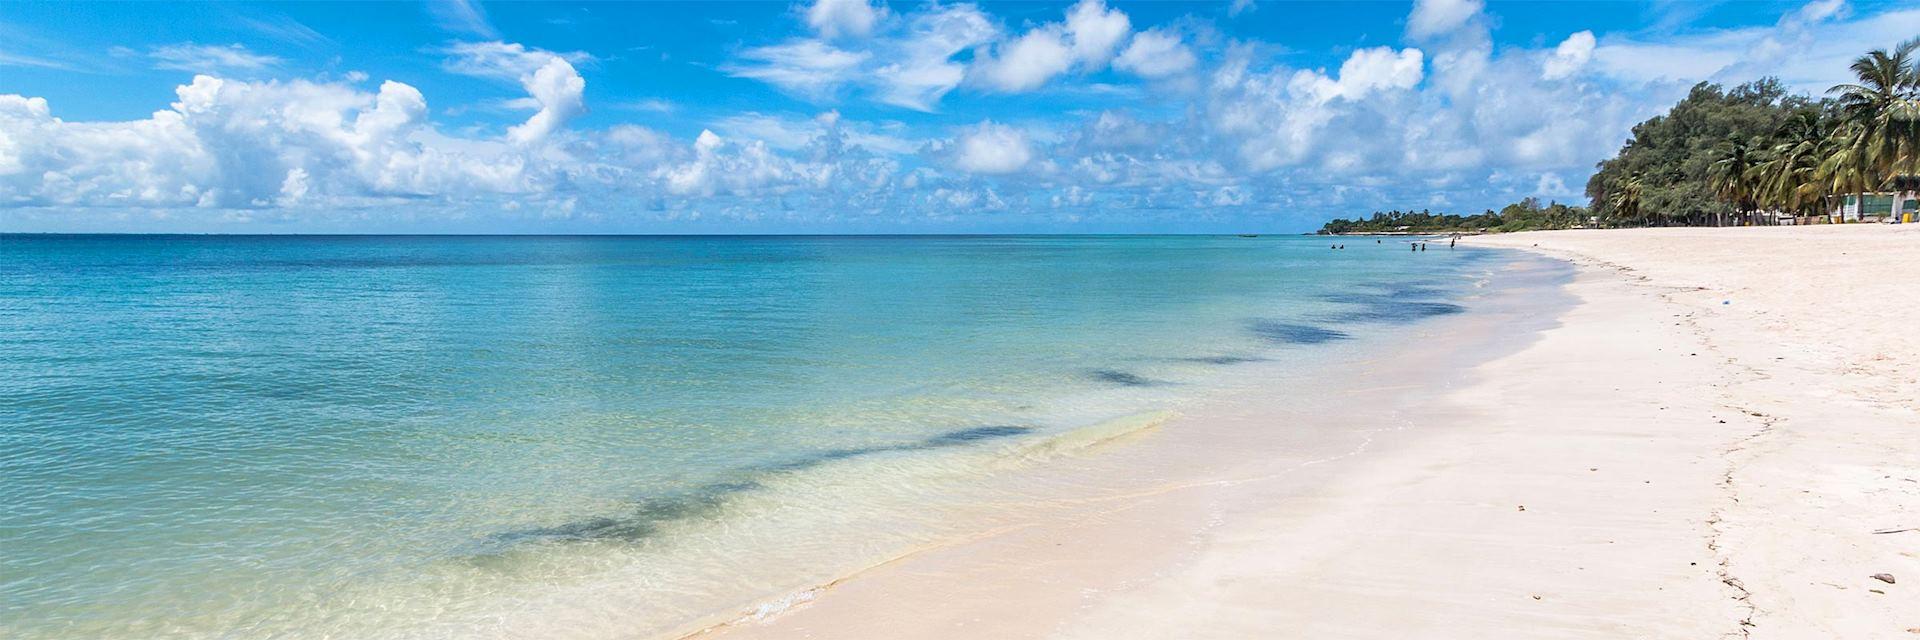 Pemba beach